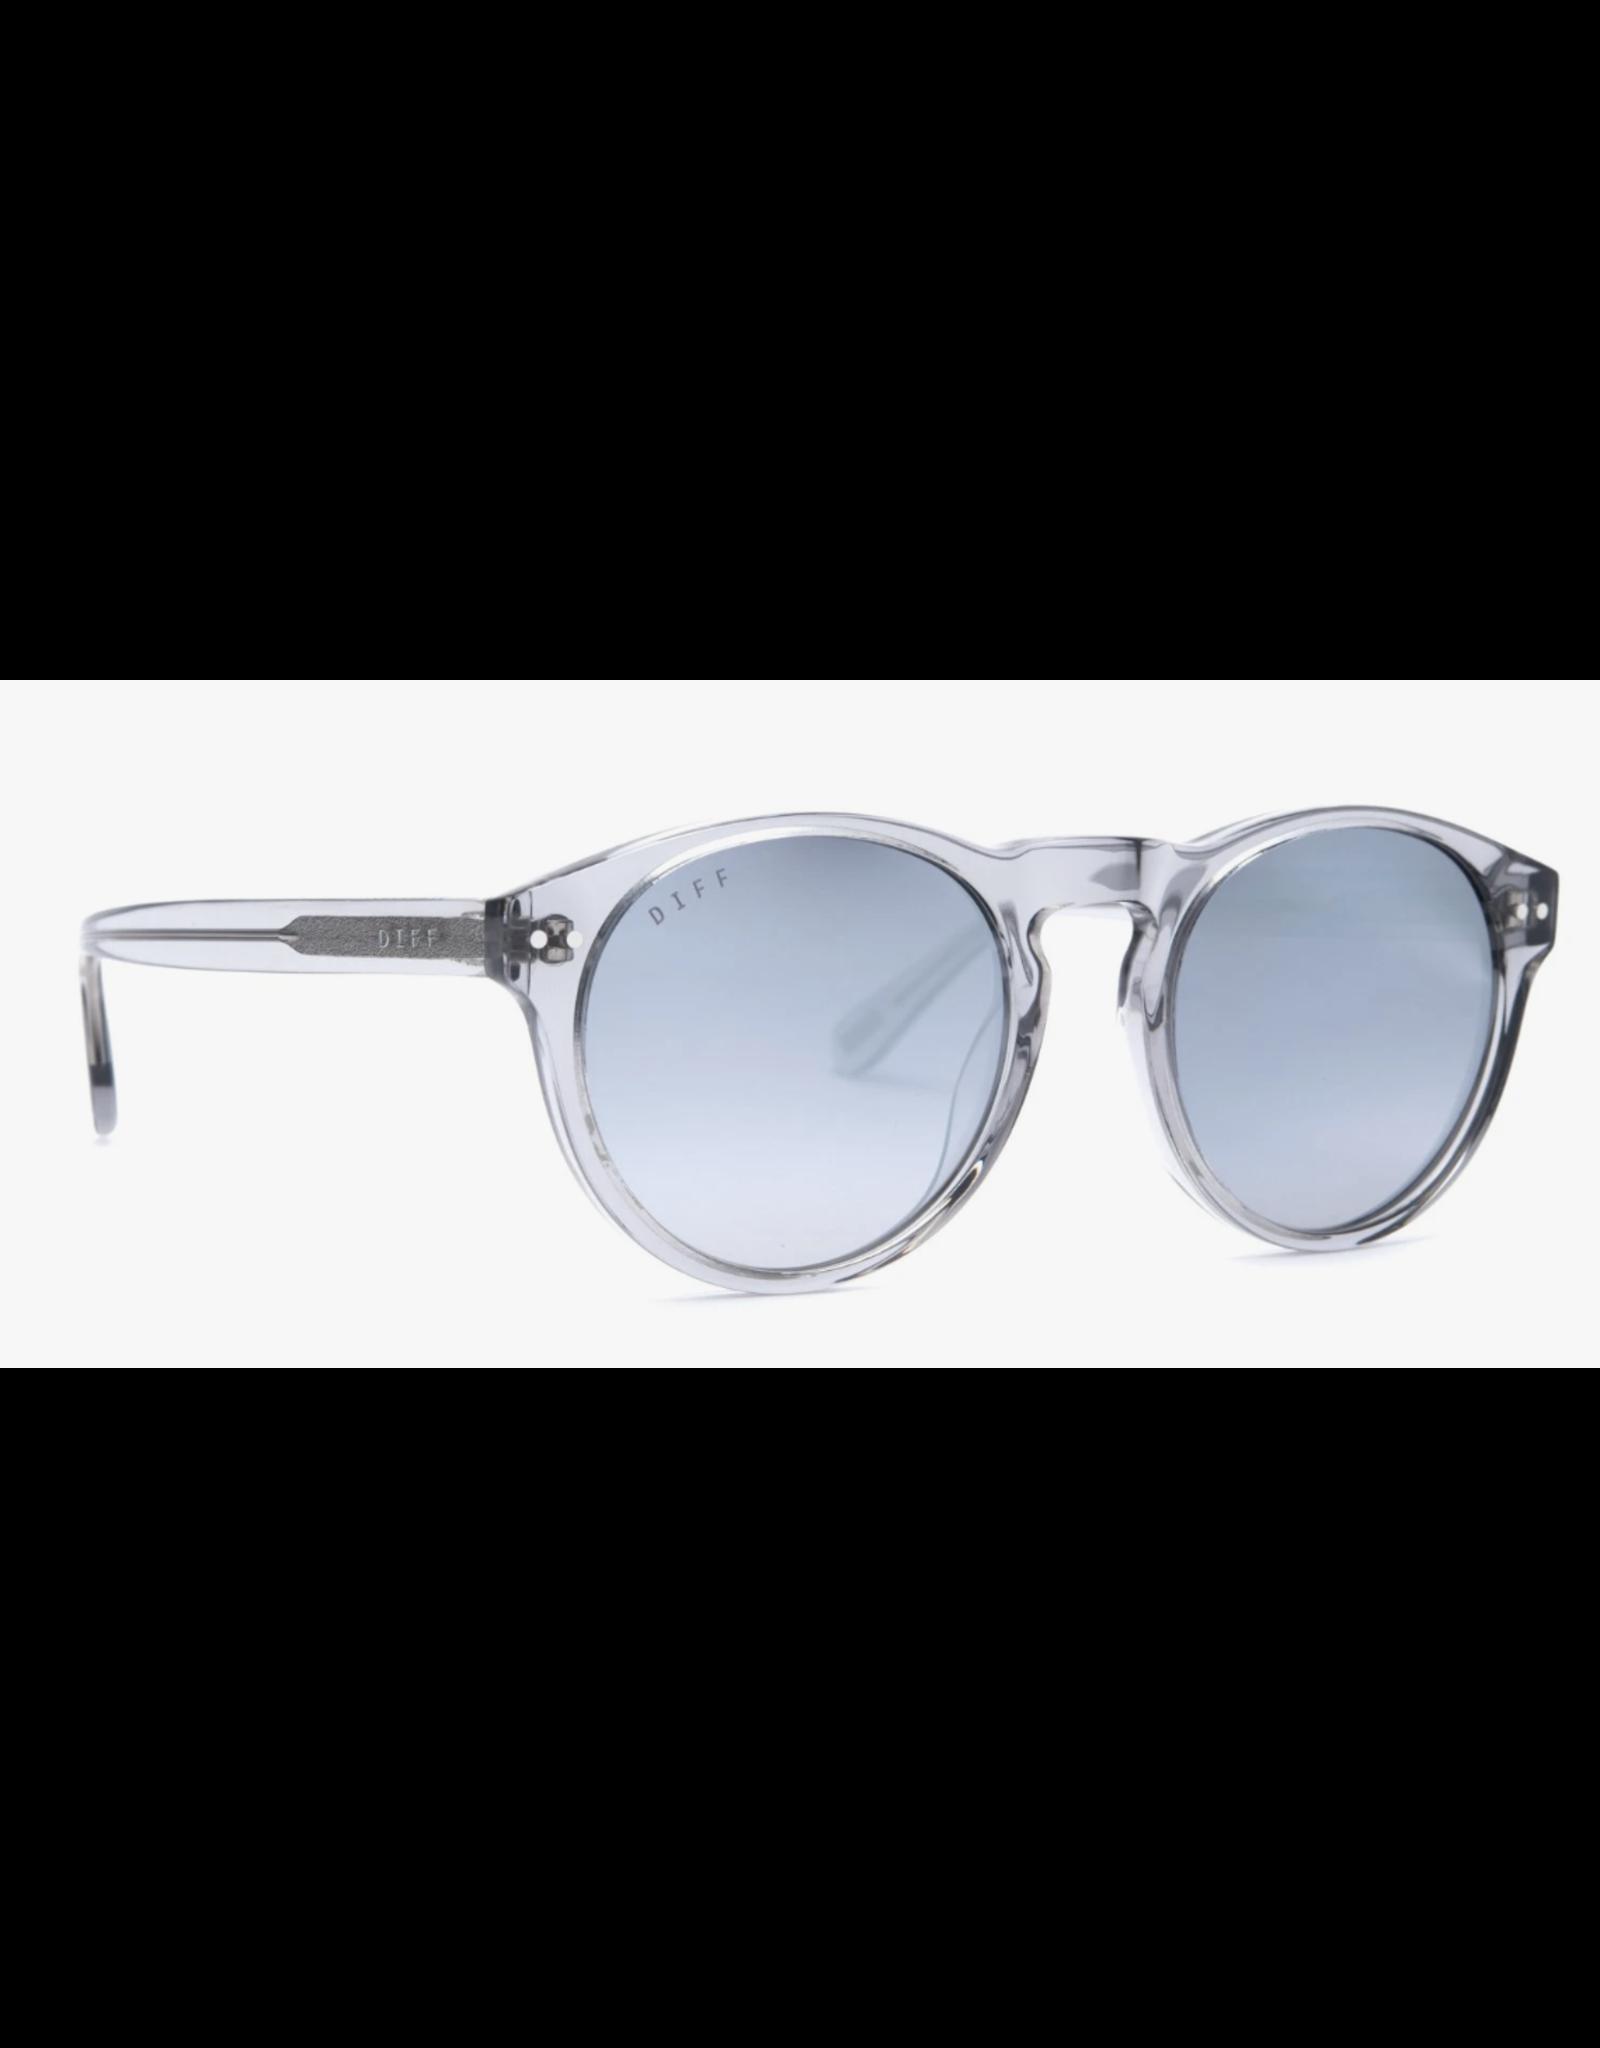 Diff Eyewear Cody Sunglasses